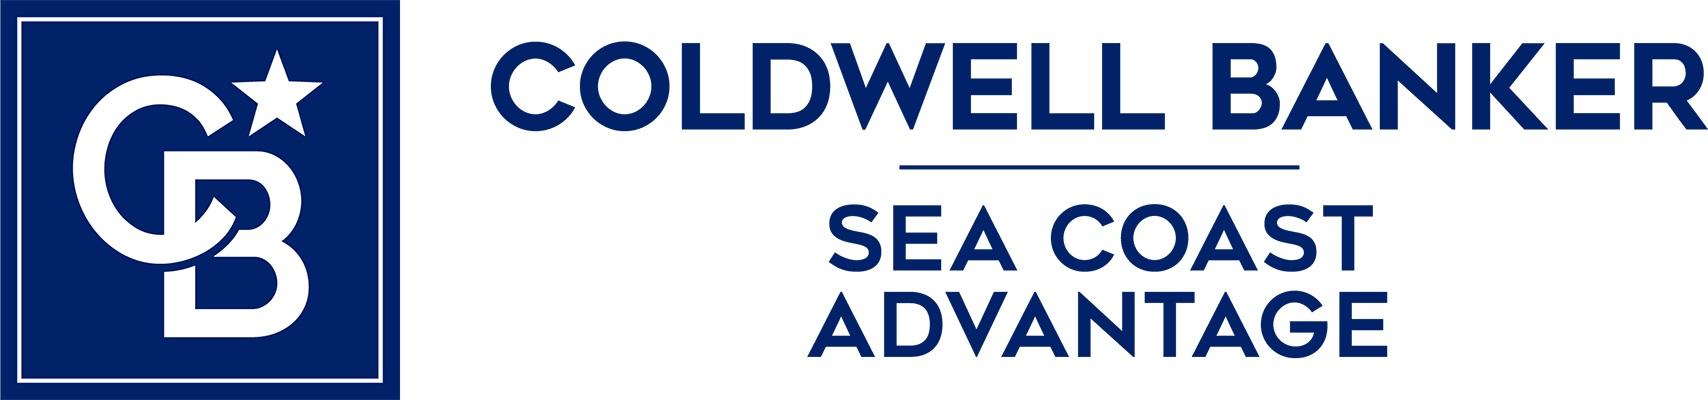 Jack Vereen - Coldwell Banker Sea Coast Advantage Realty Logo